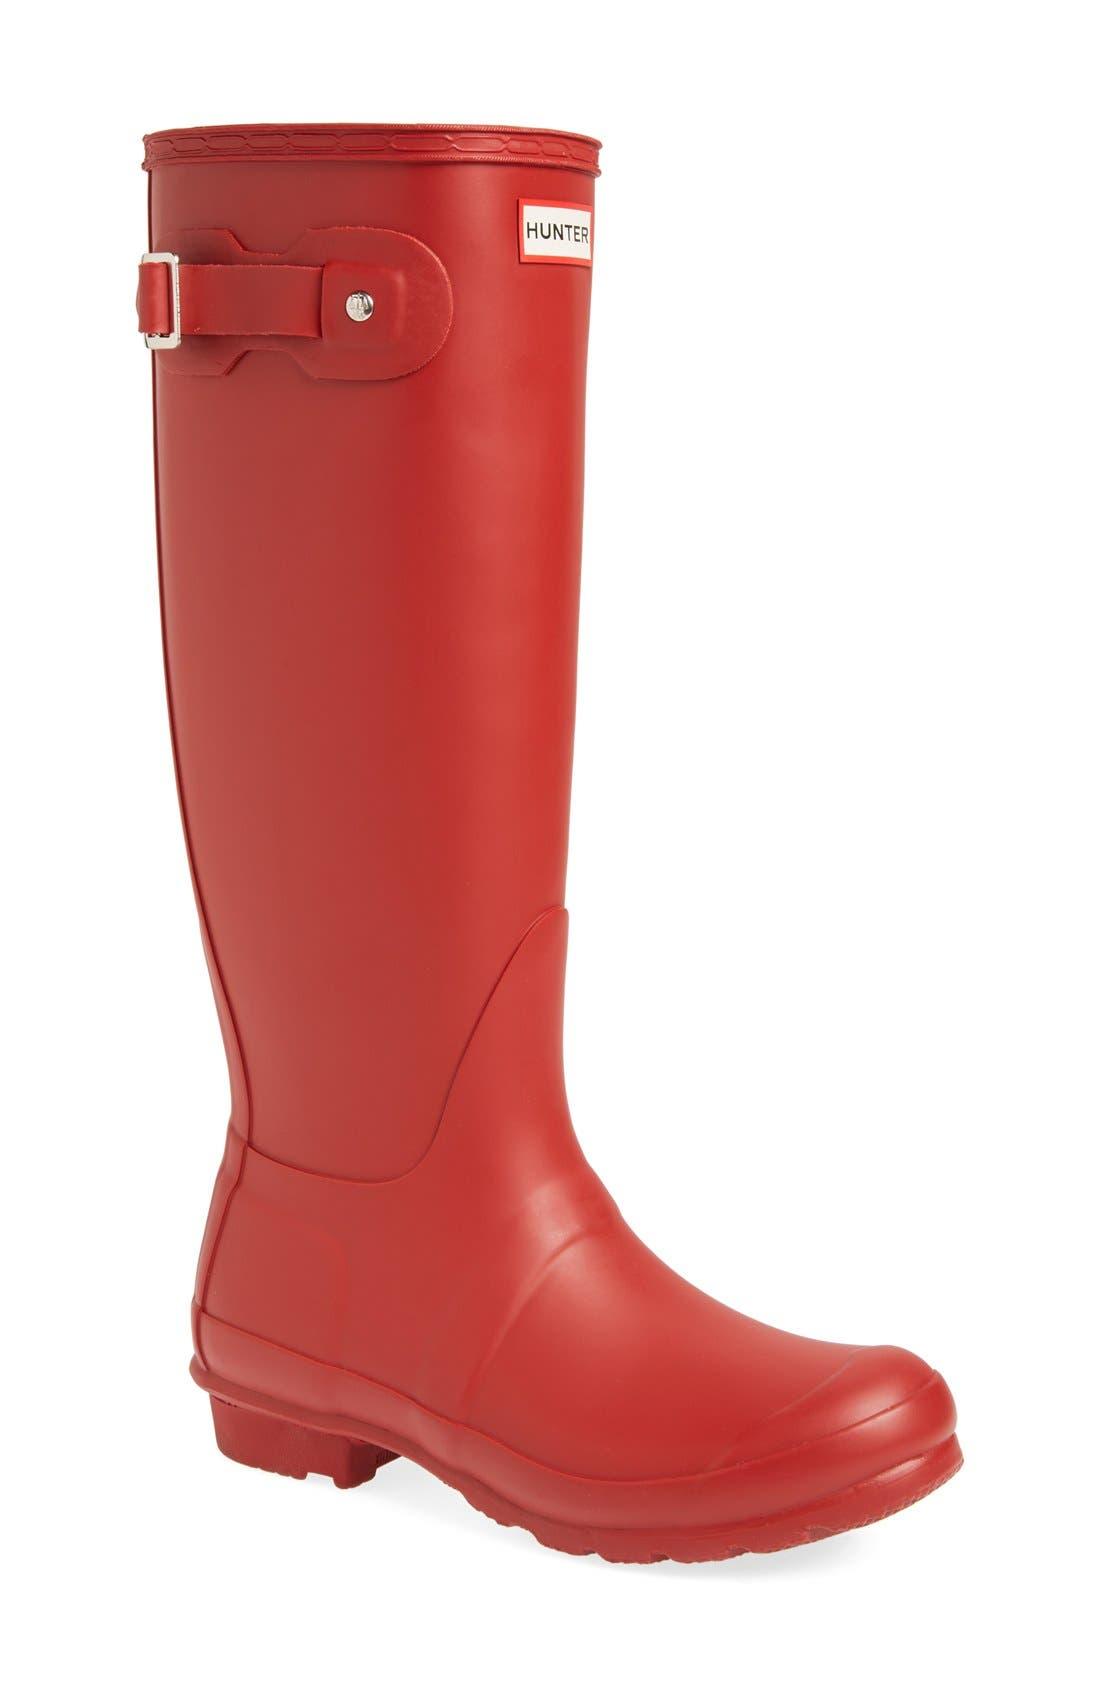 Wonderful Boots Unisex Bright F63103004